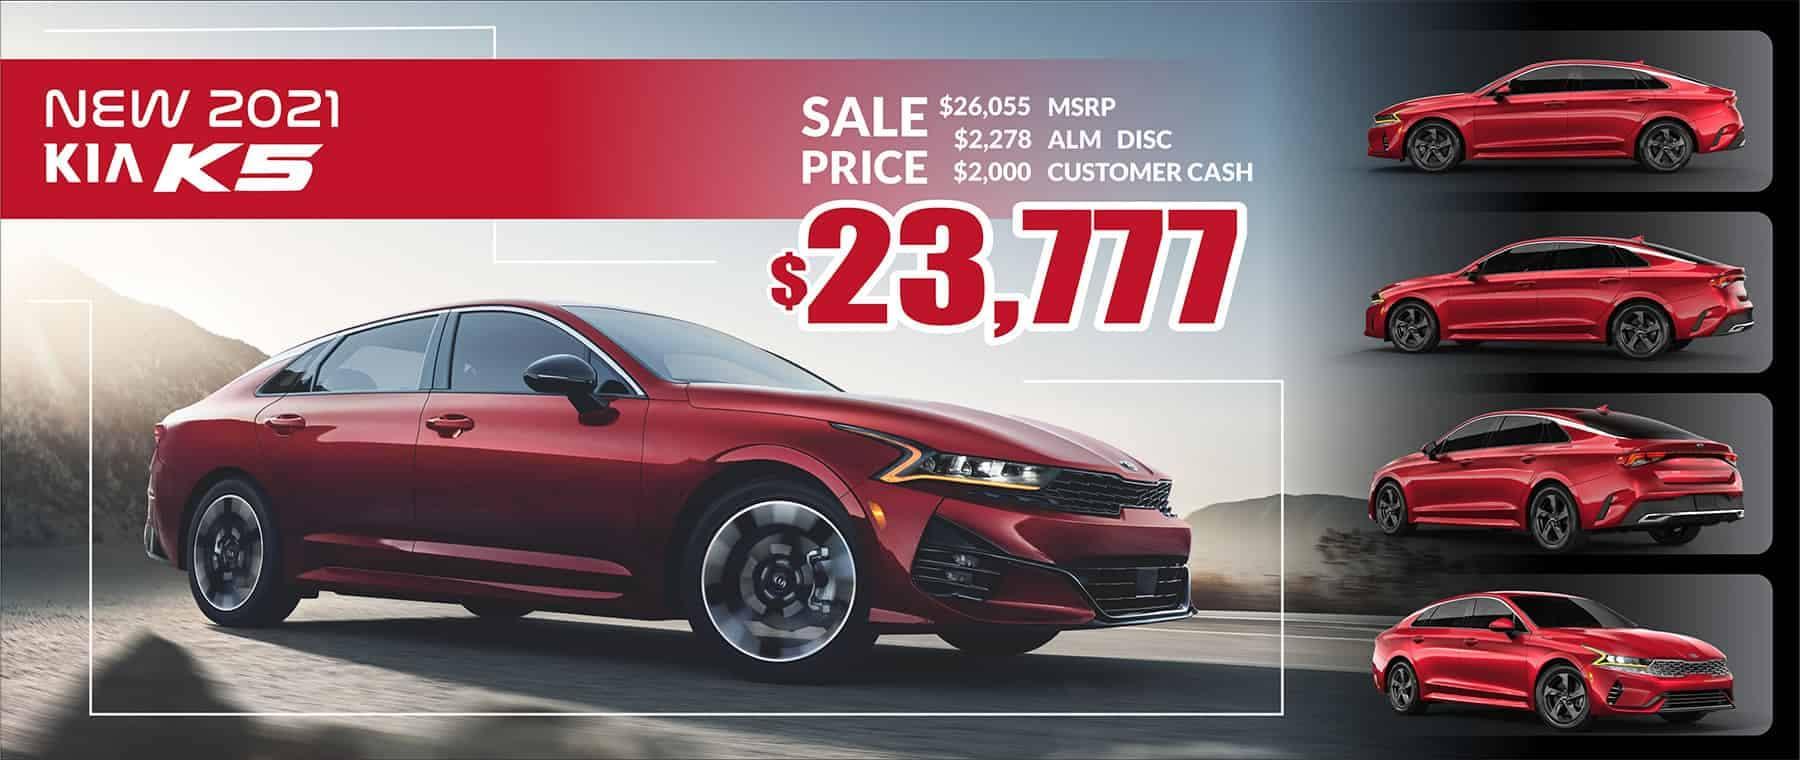 2021 Kia K5 Sale Price $23,777